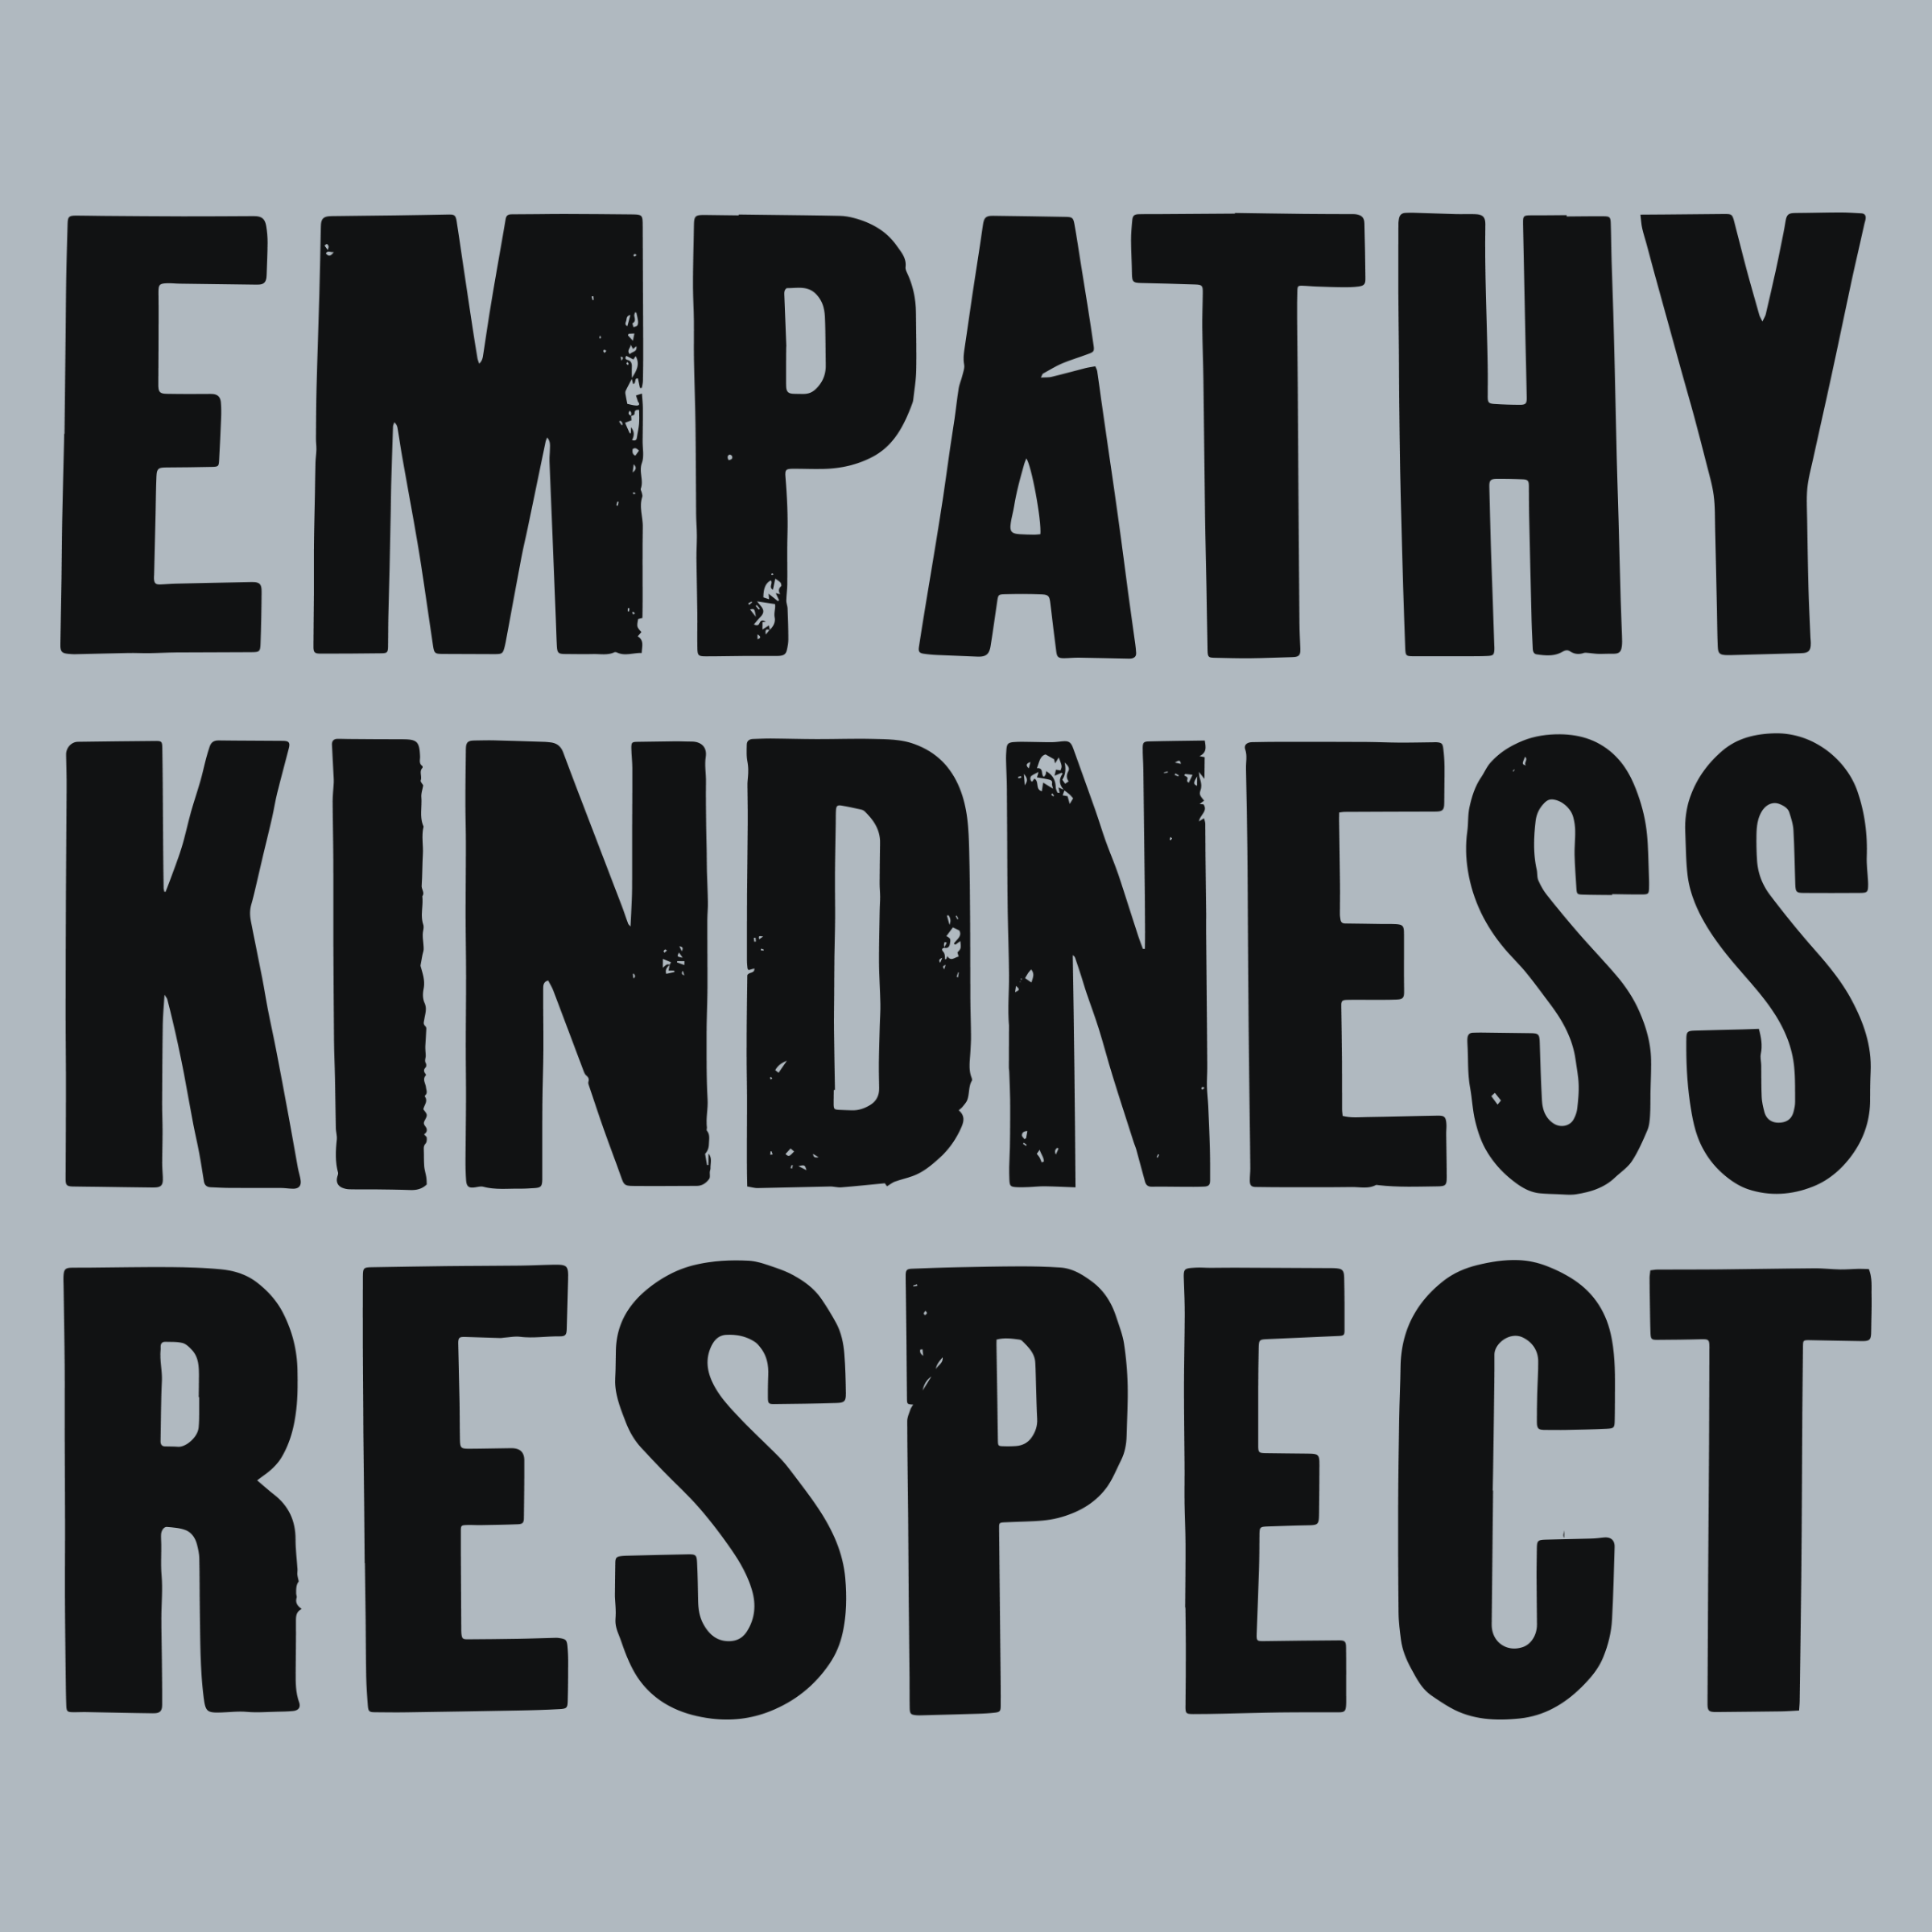 Empathy, Kindness, Respect